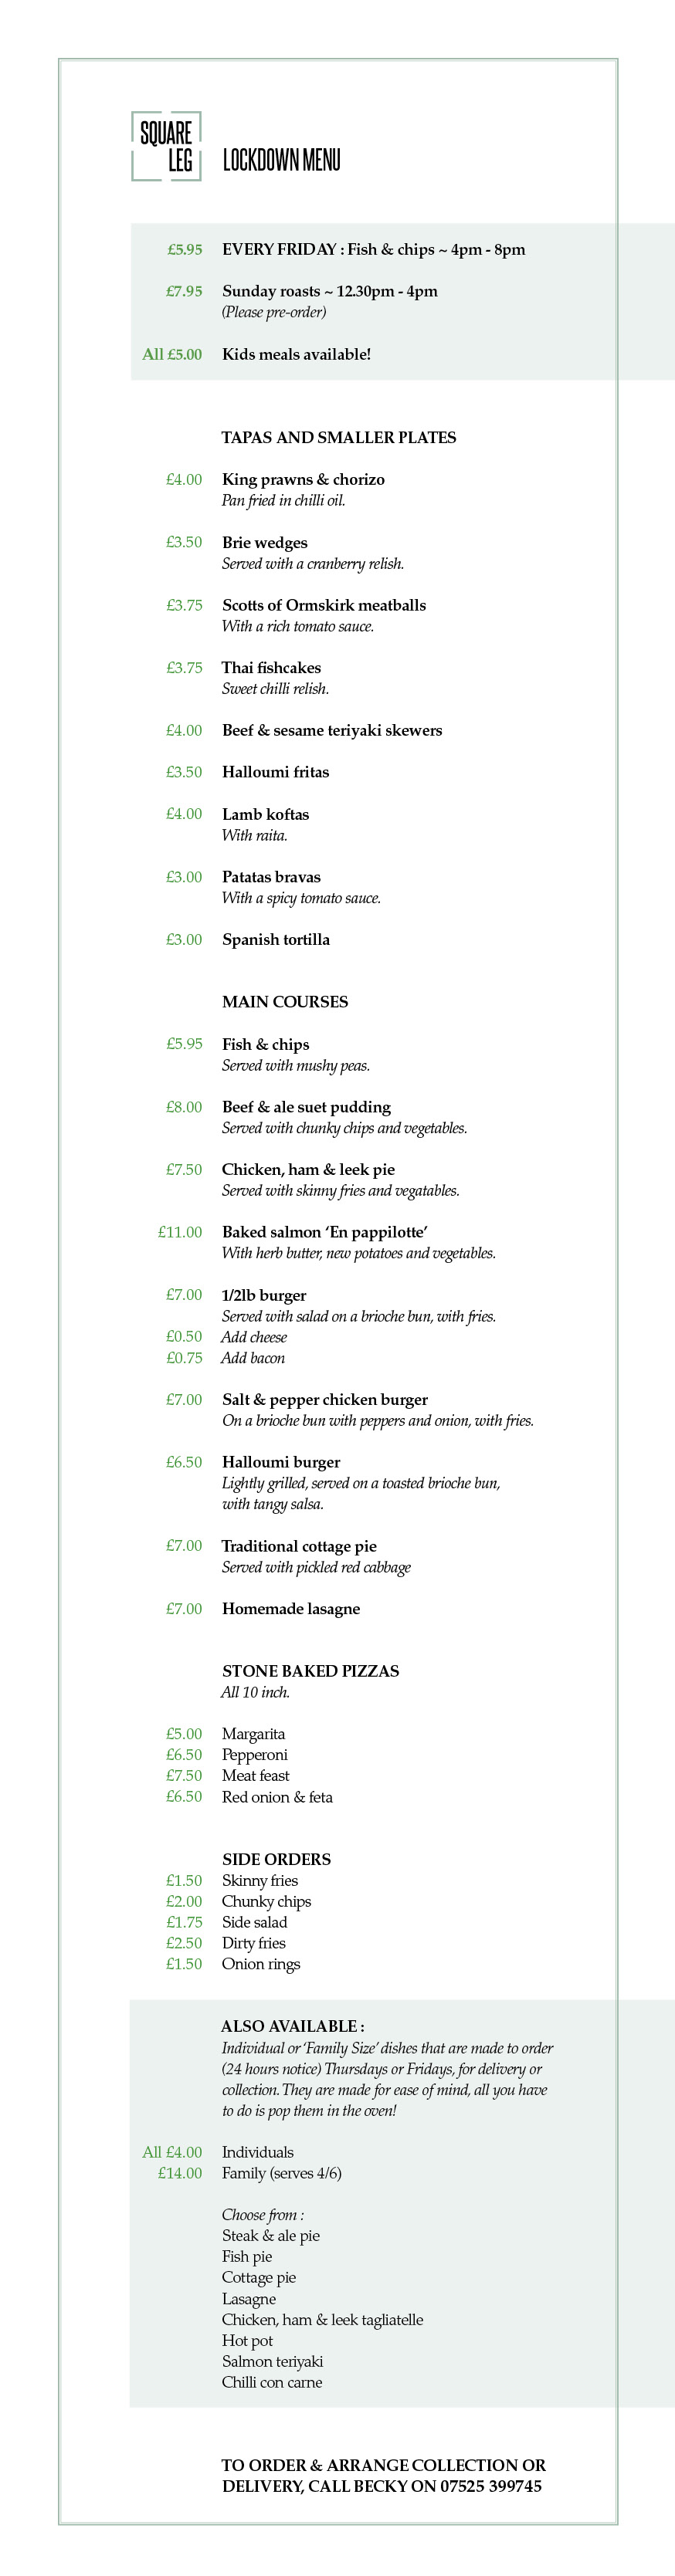 Square Leg Lockdown menu